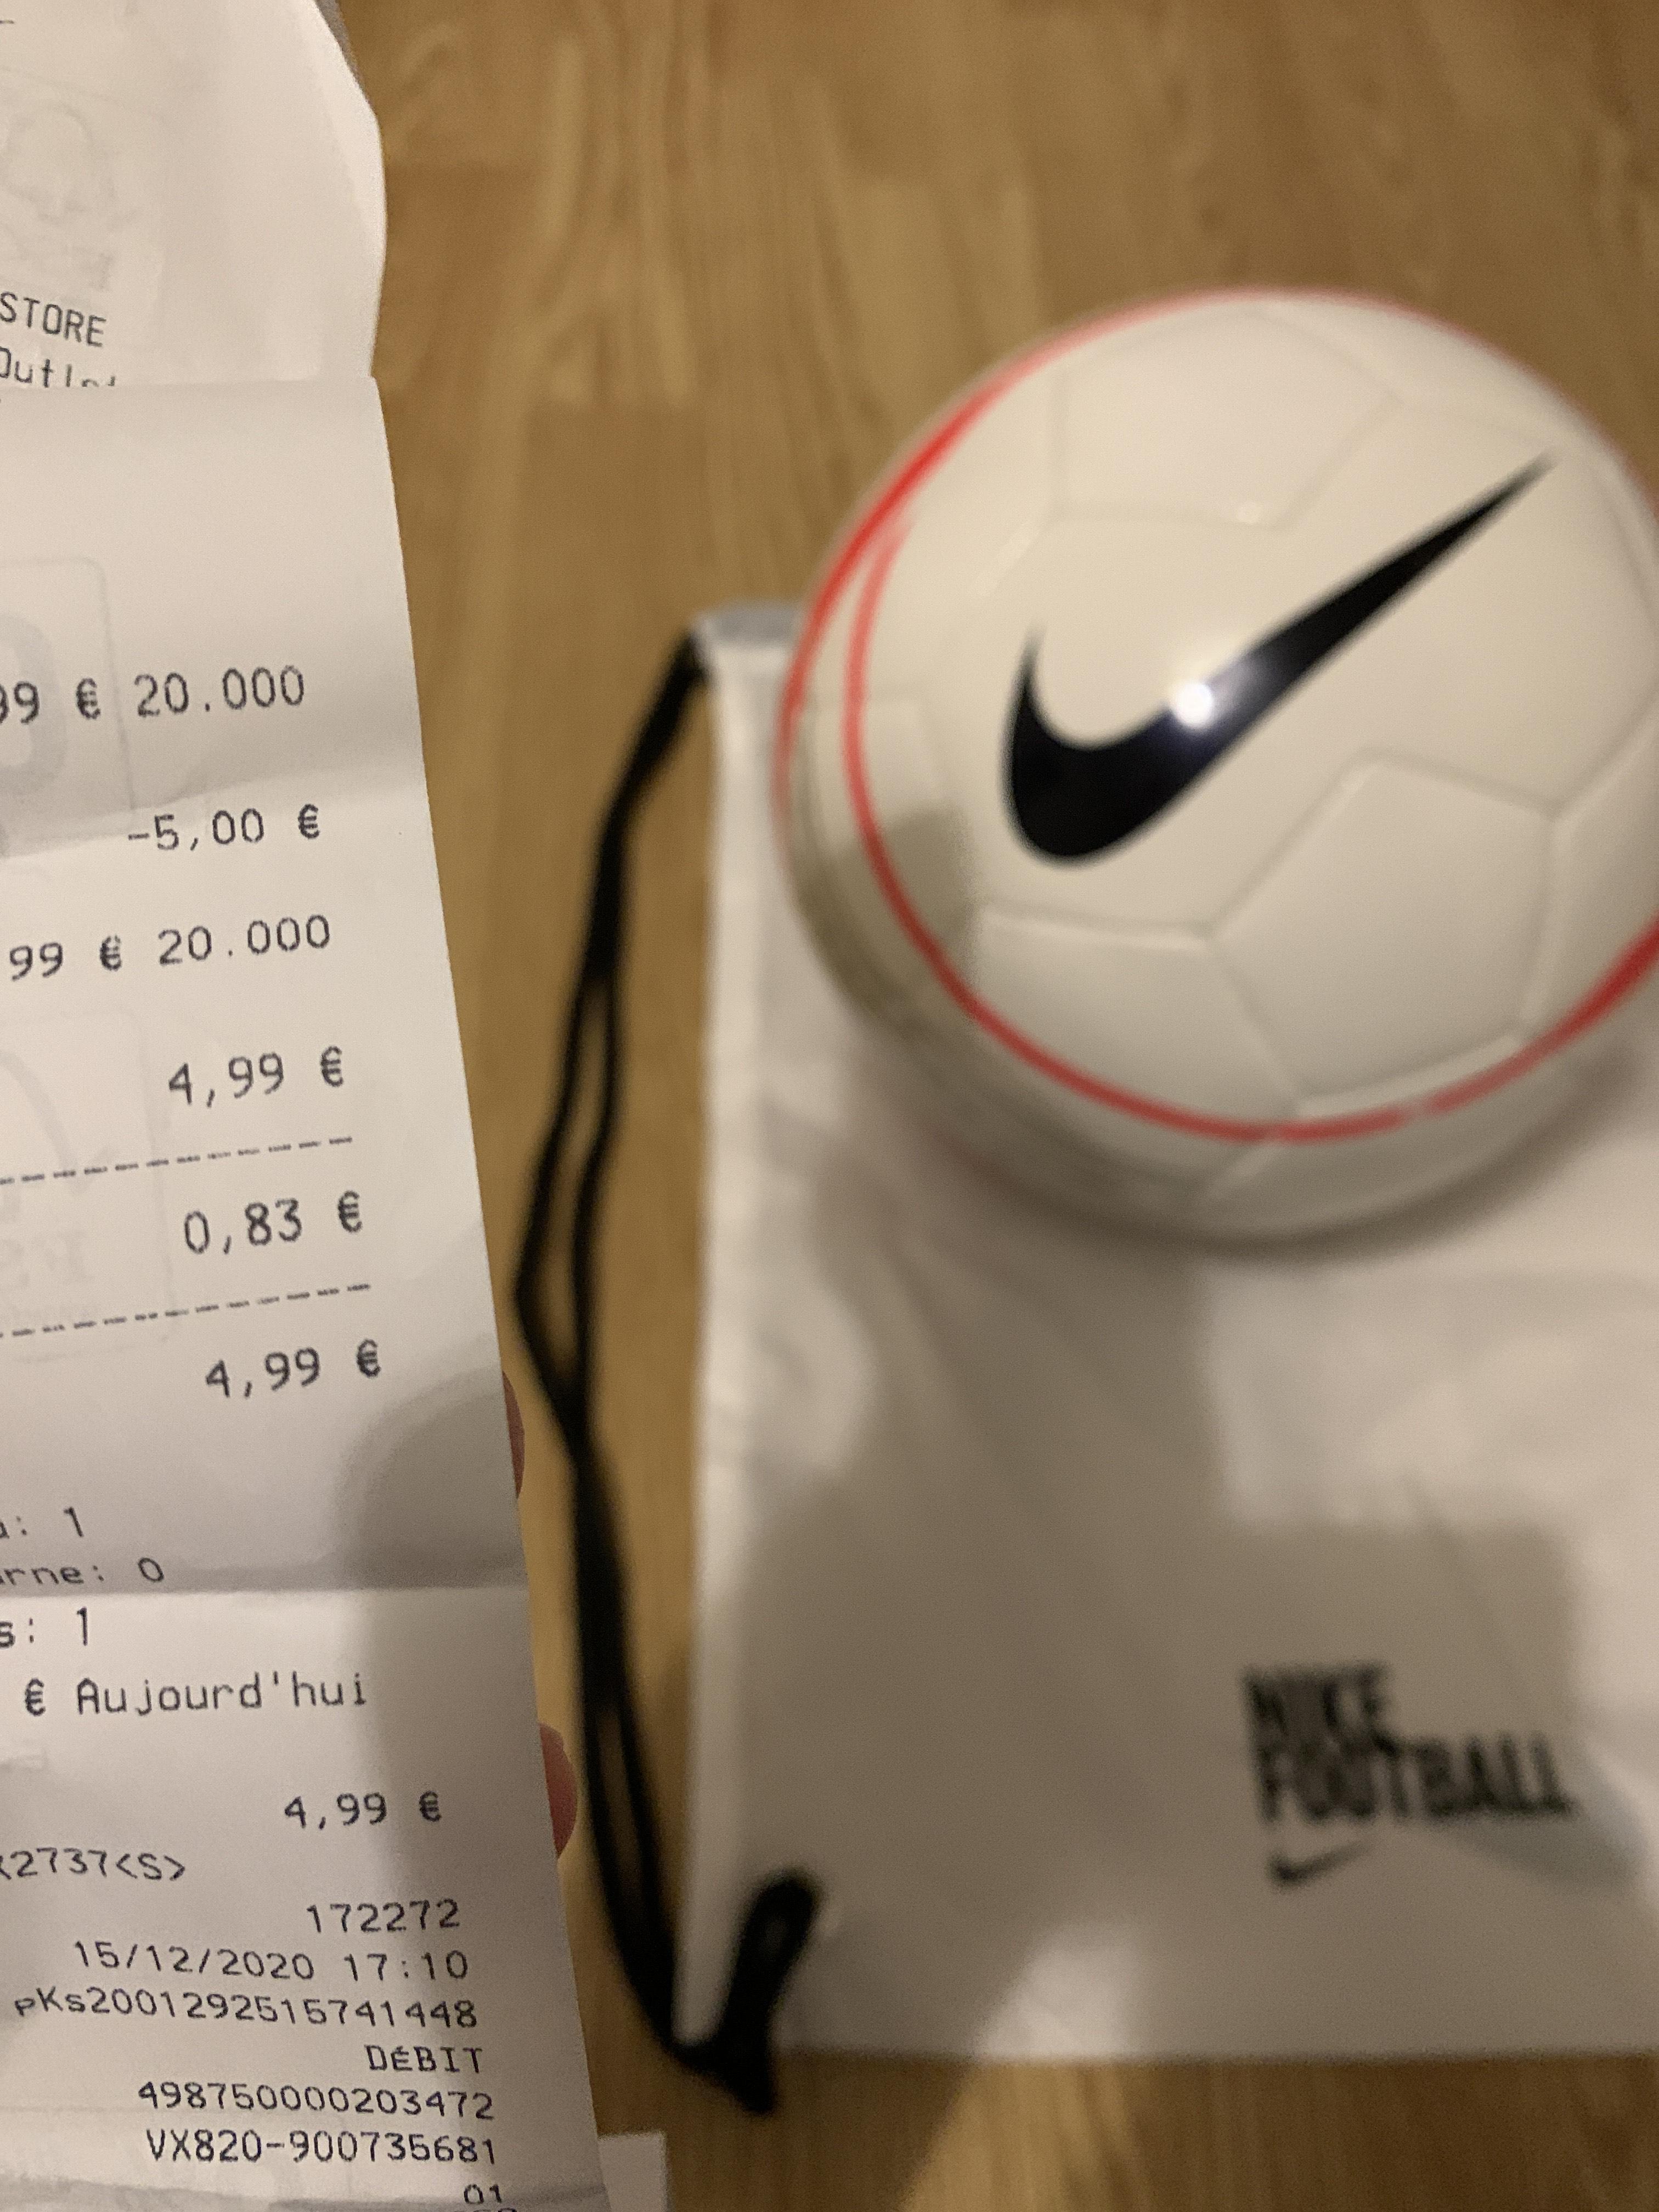 Ballon football Nike - Nike Factory Store Roppenheim (67)